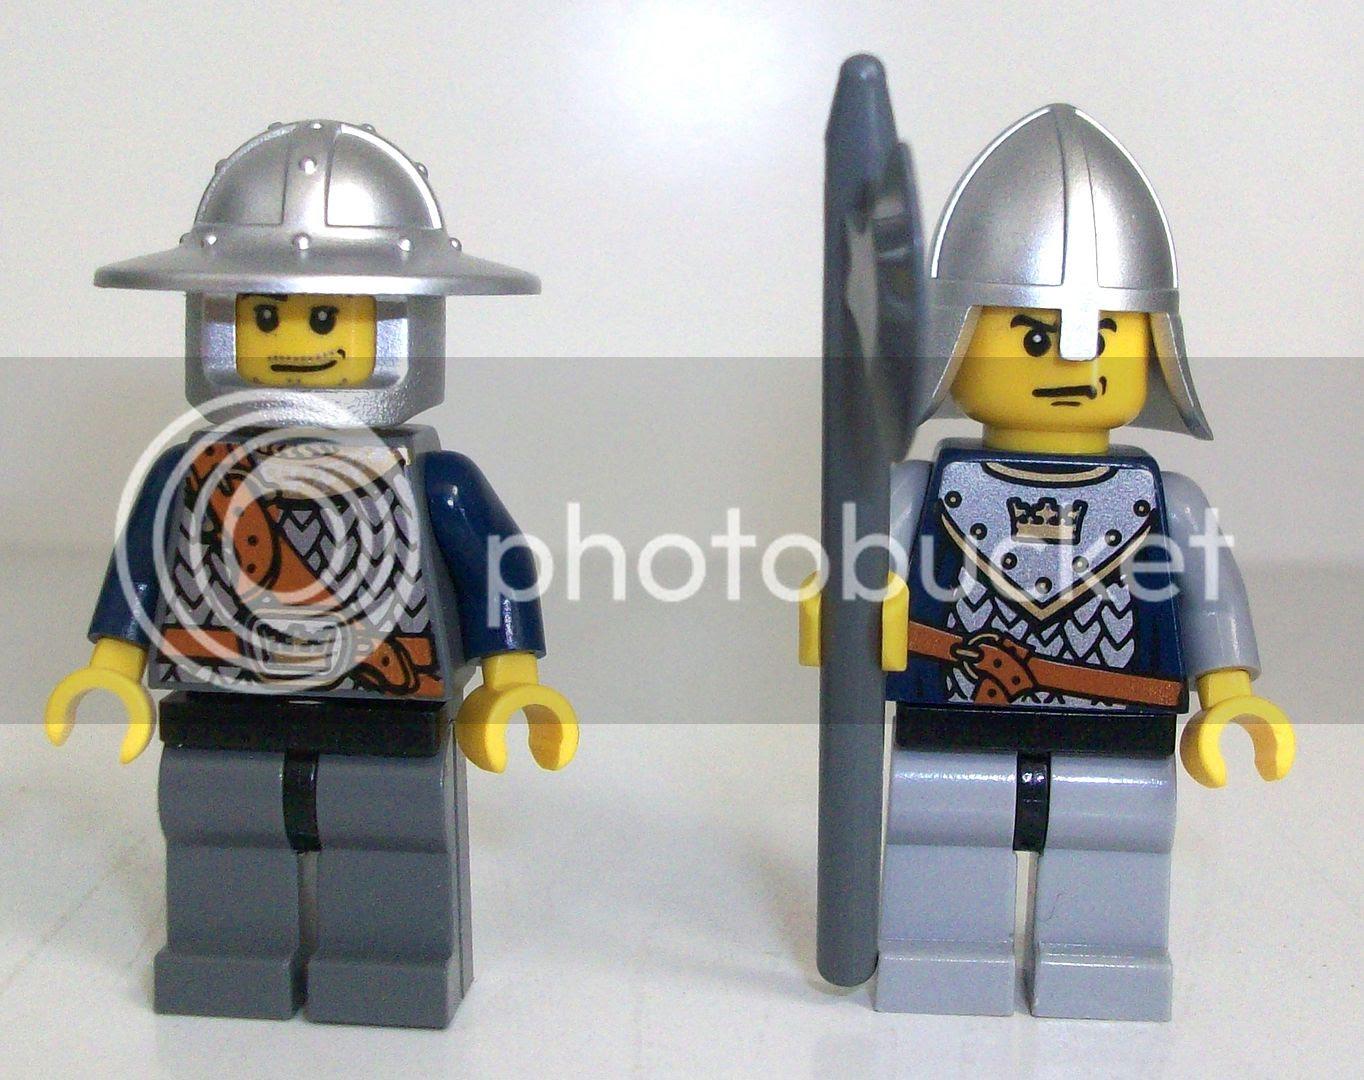 Lego #7090 photo 100_5010_zpsf65463f8.jpg